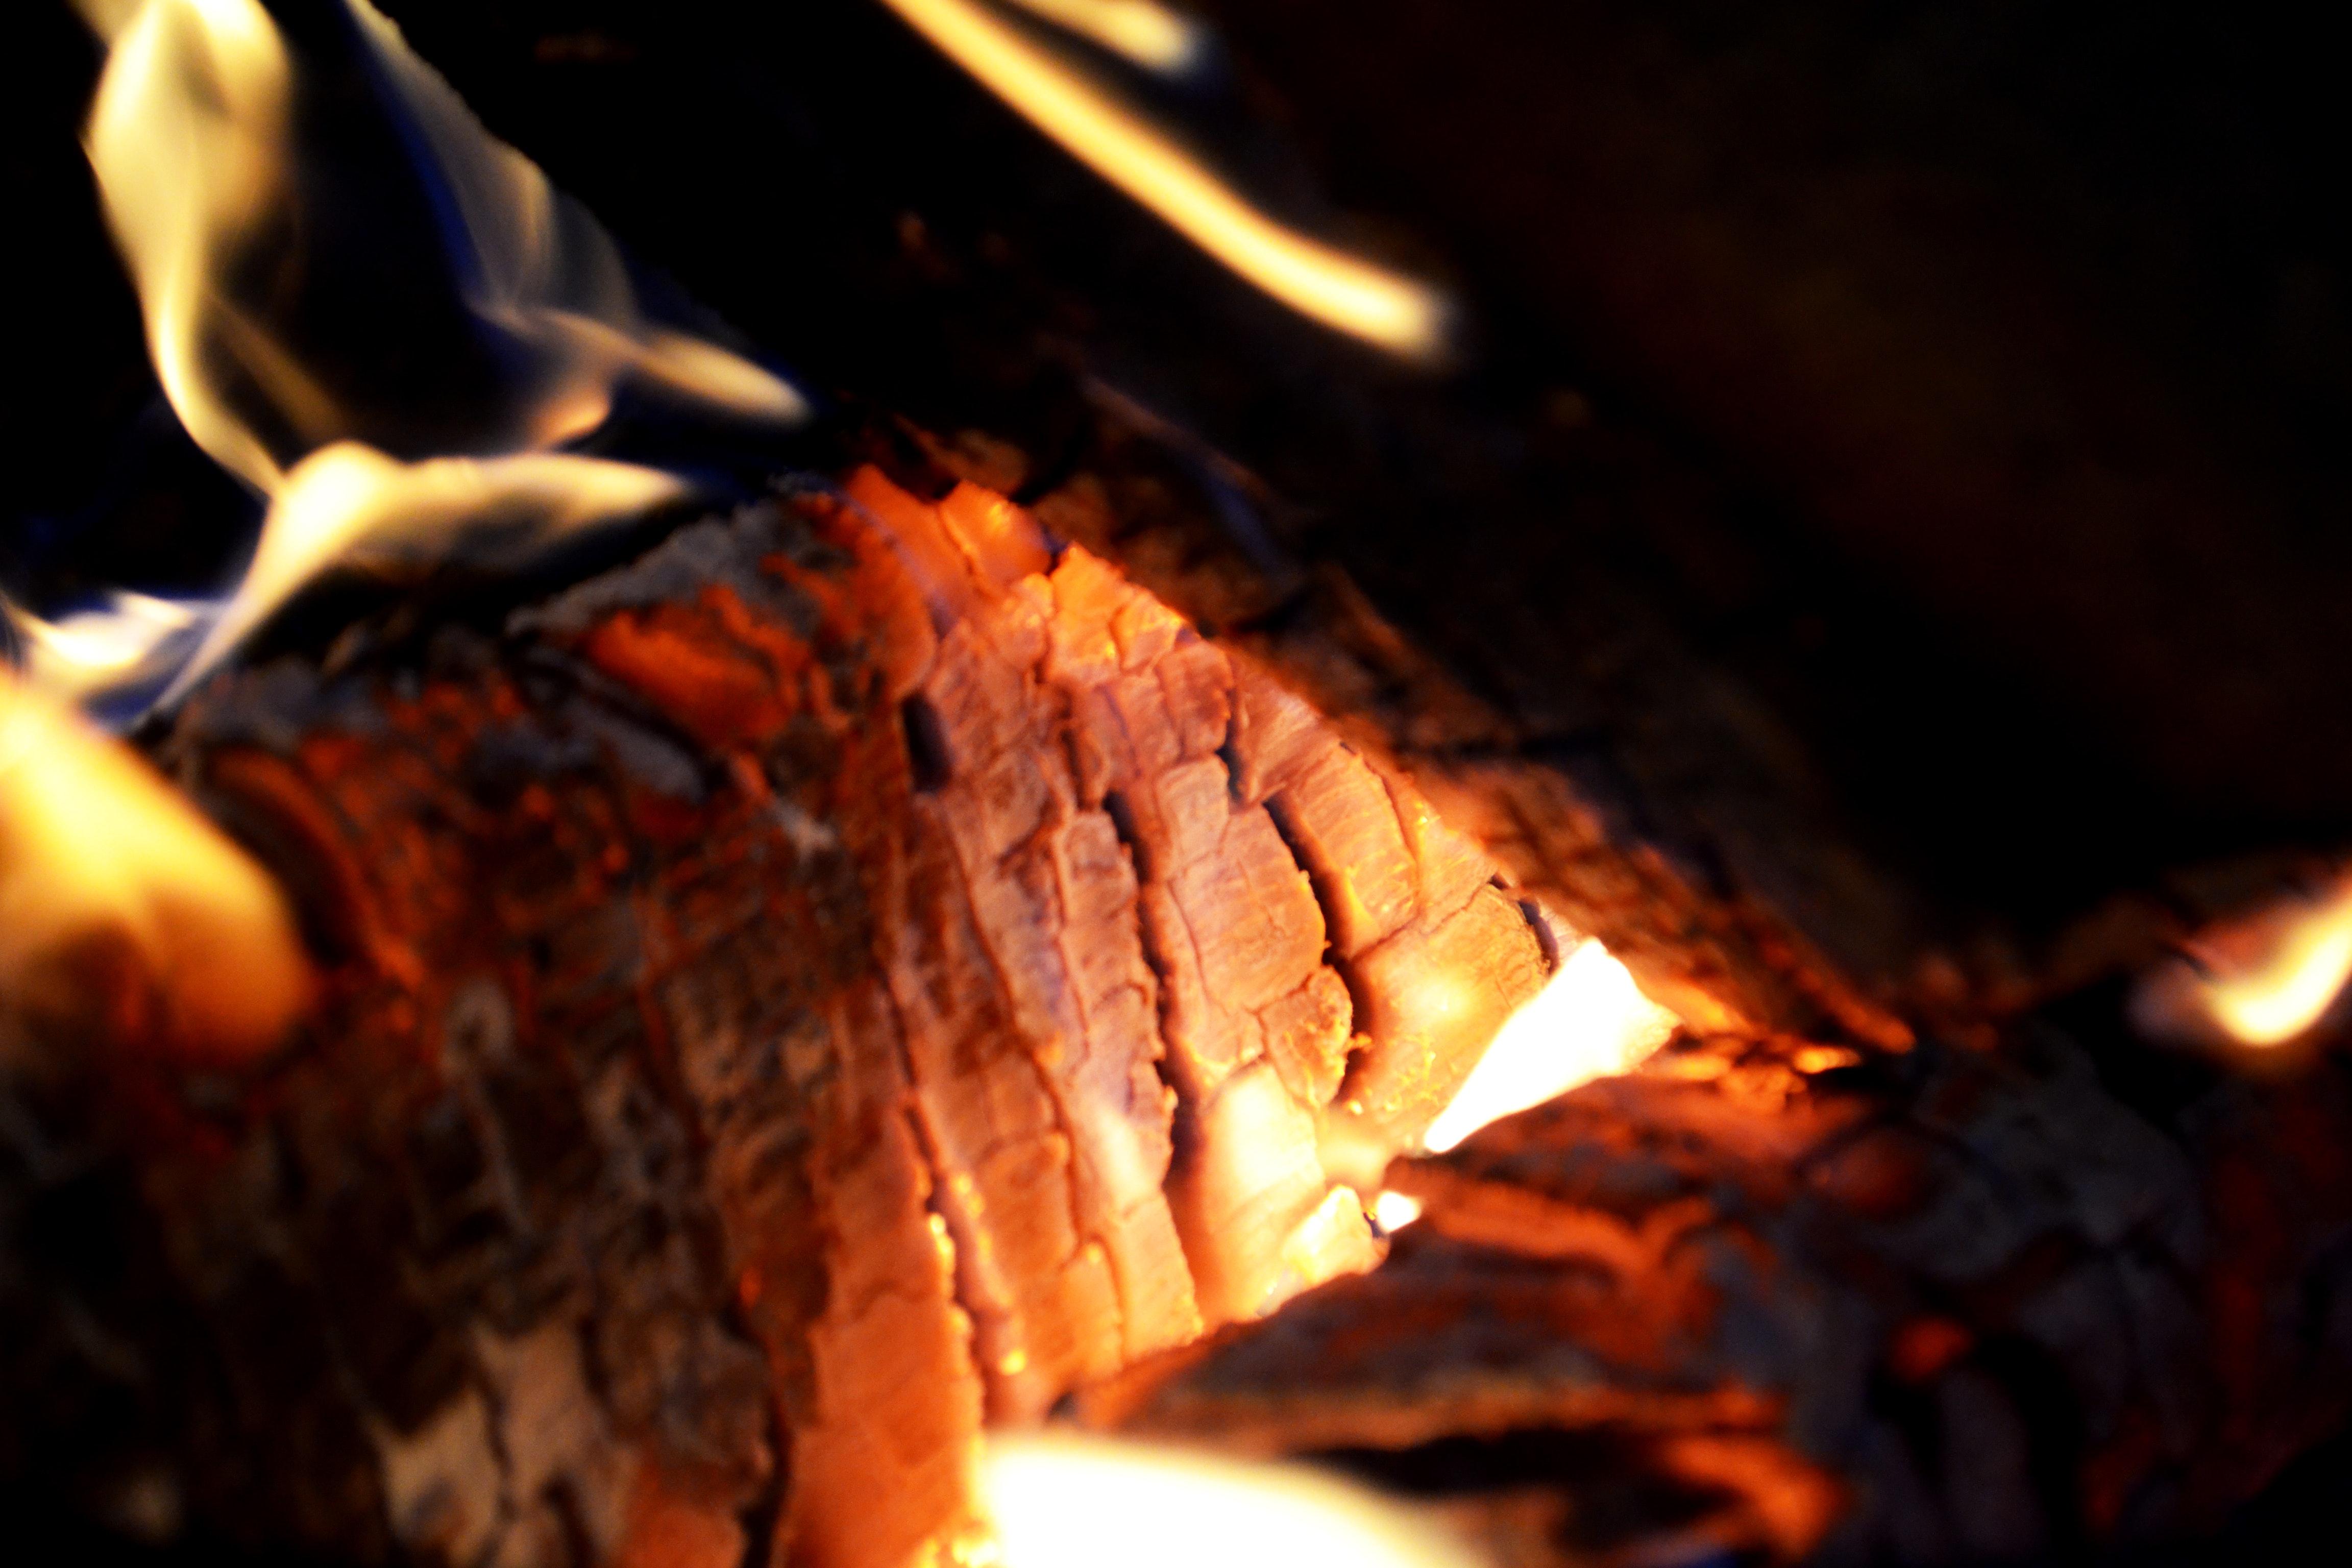 Fireplace illustration photo